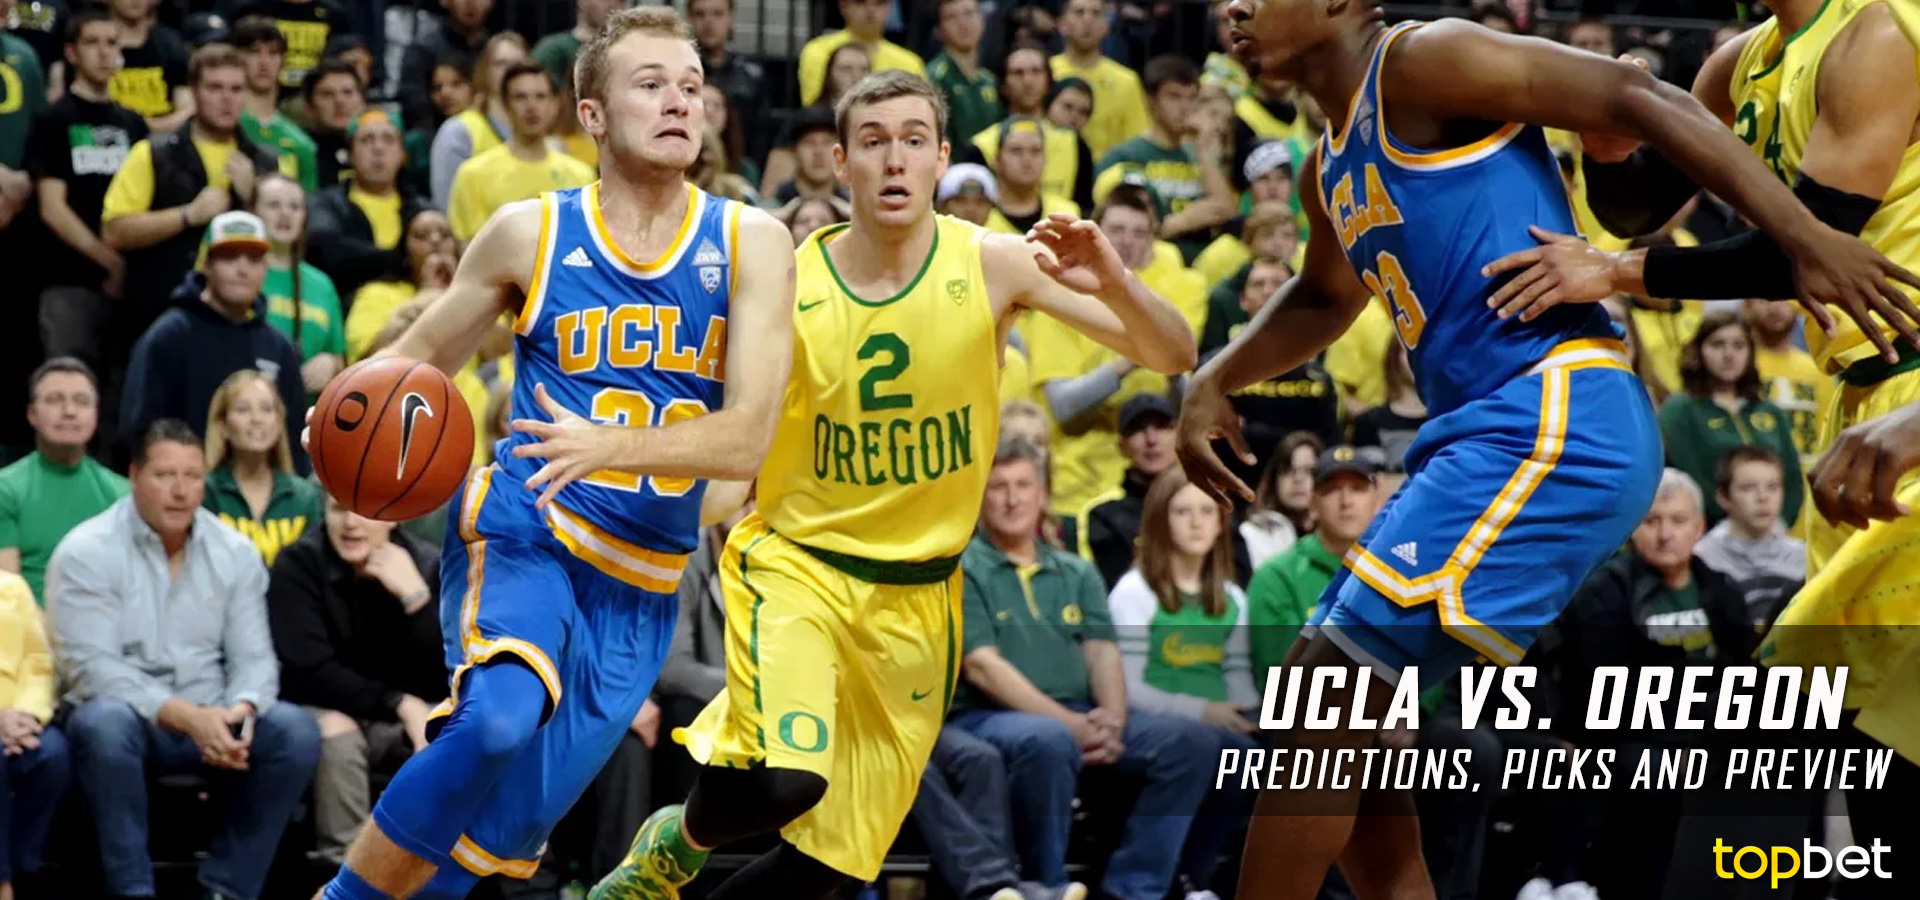 Ucla Vs Oregon Basketball Predictions Picks Odds Preview